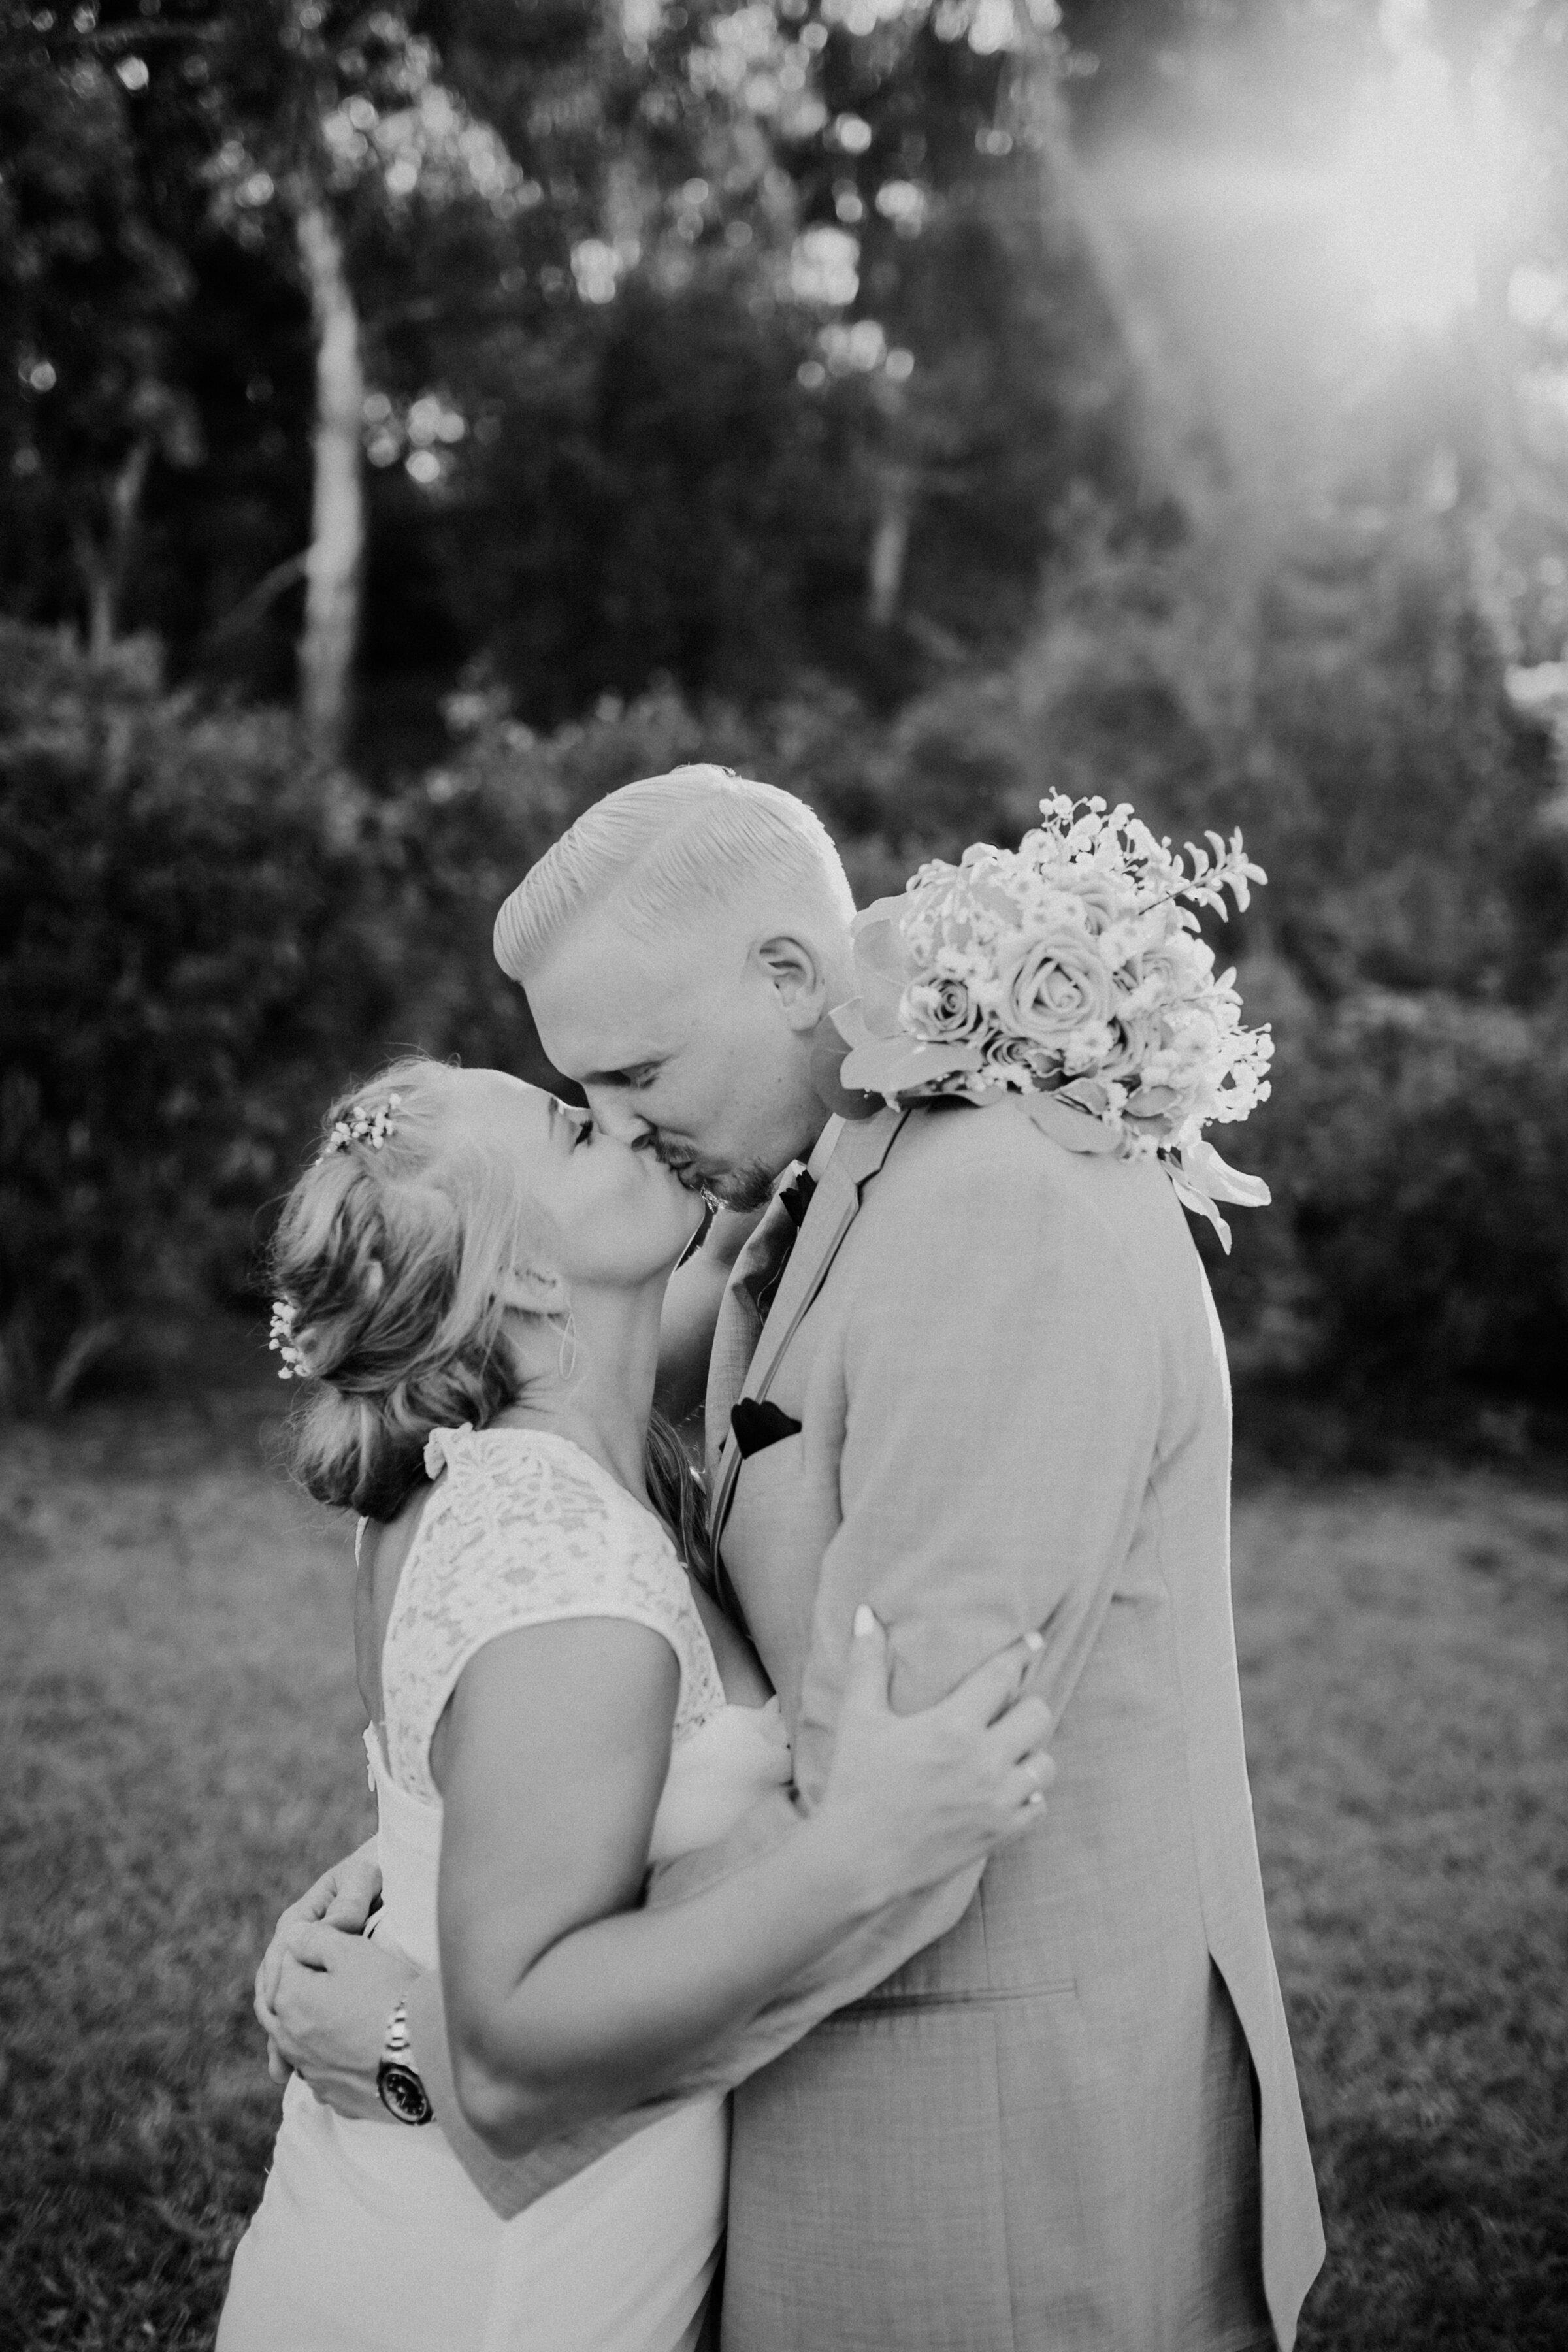 amphoto kj vowel renewal bridals-297.jpg